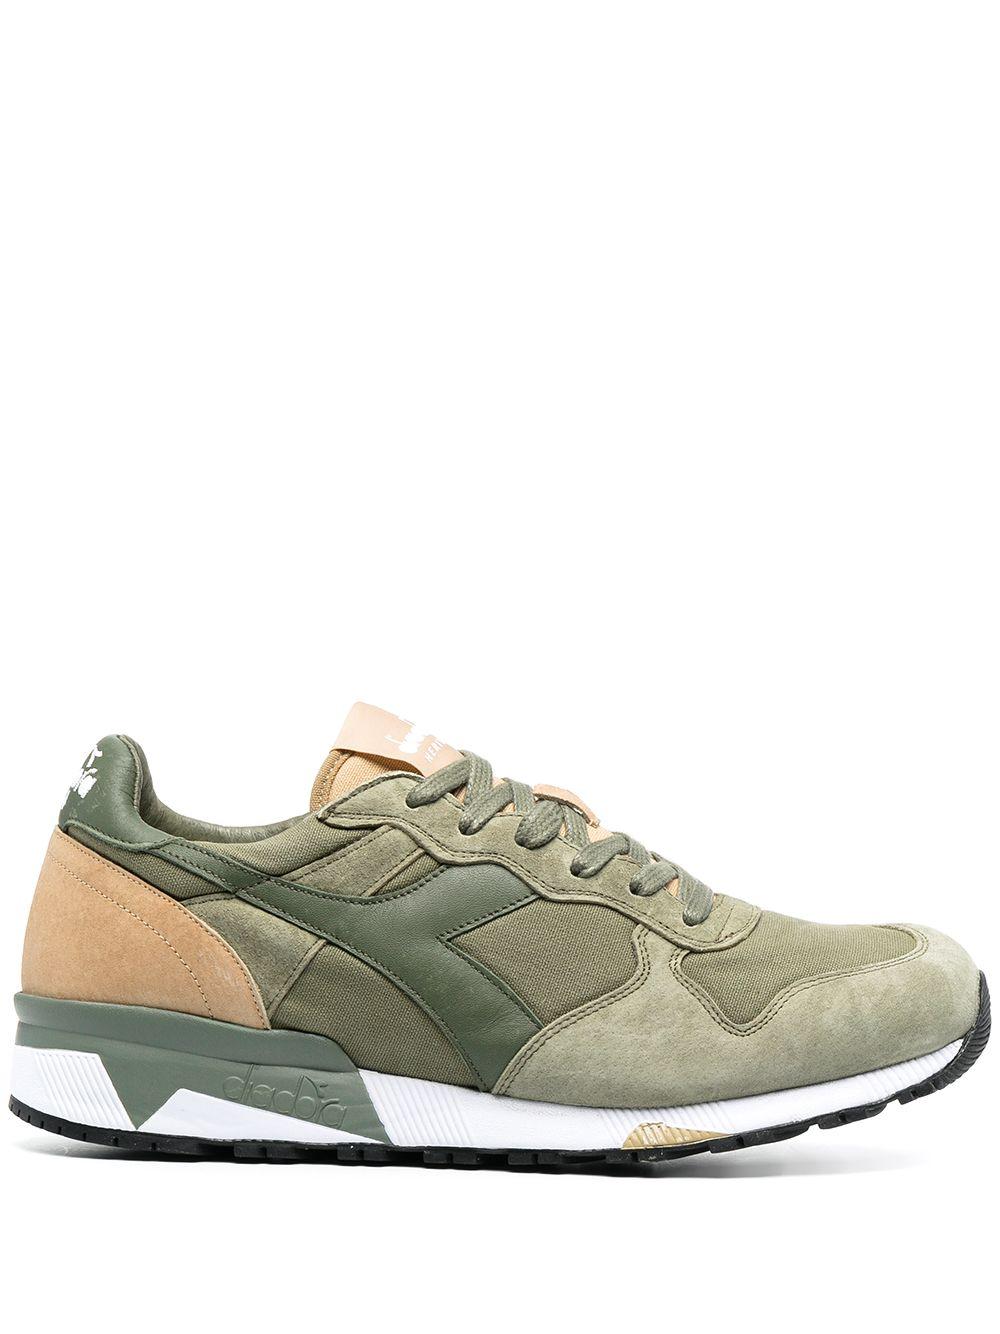 Diadora trident 90 sneakers man DIADORA | Sneakers | 201.17628170418